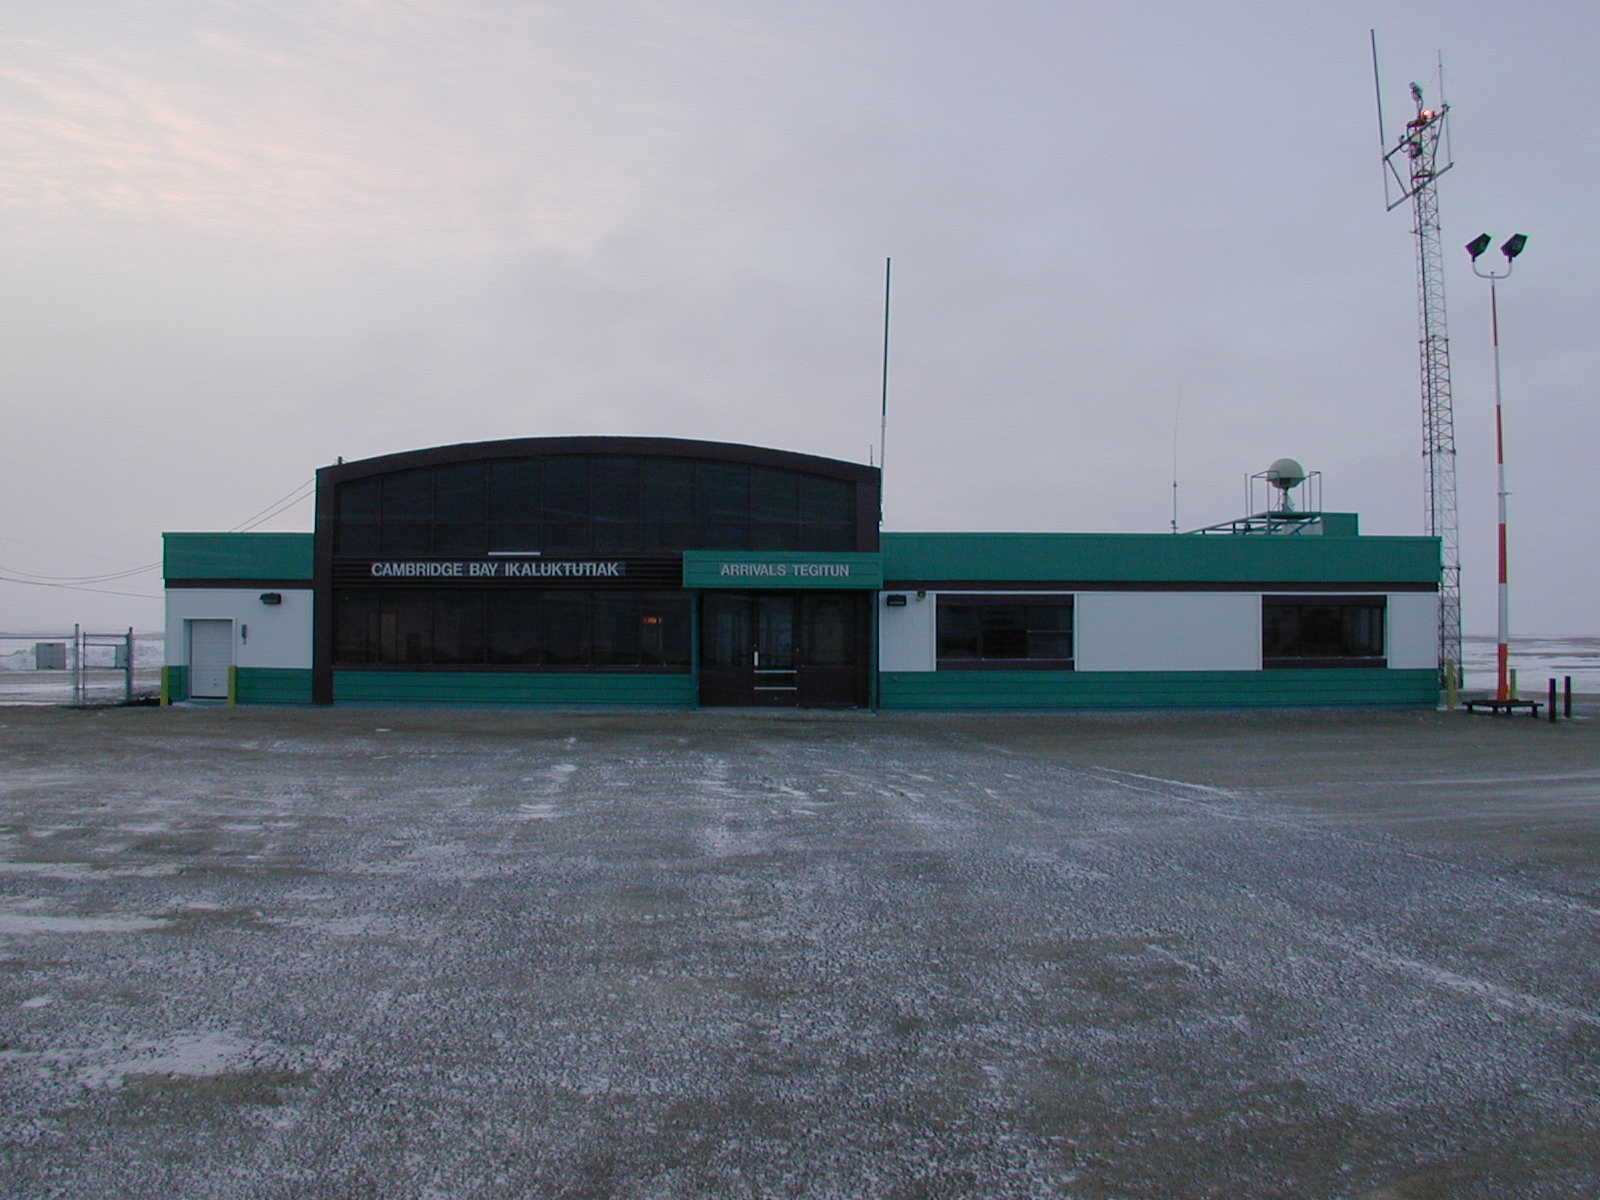 Cambridge Bayn lentoasema